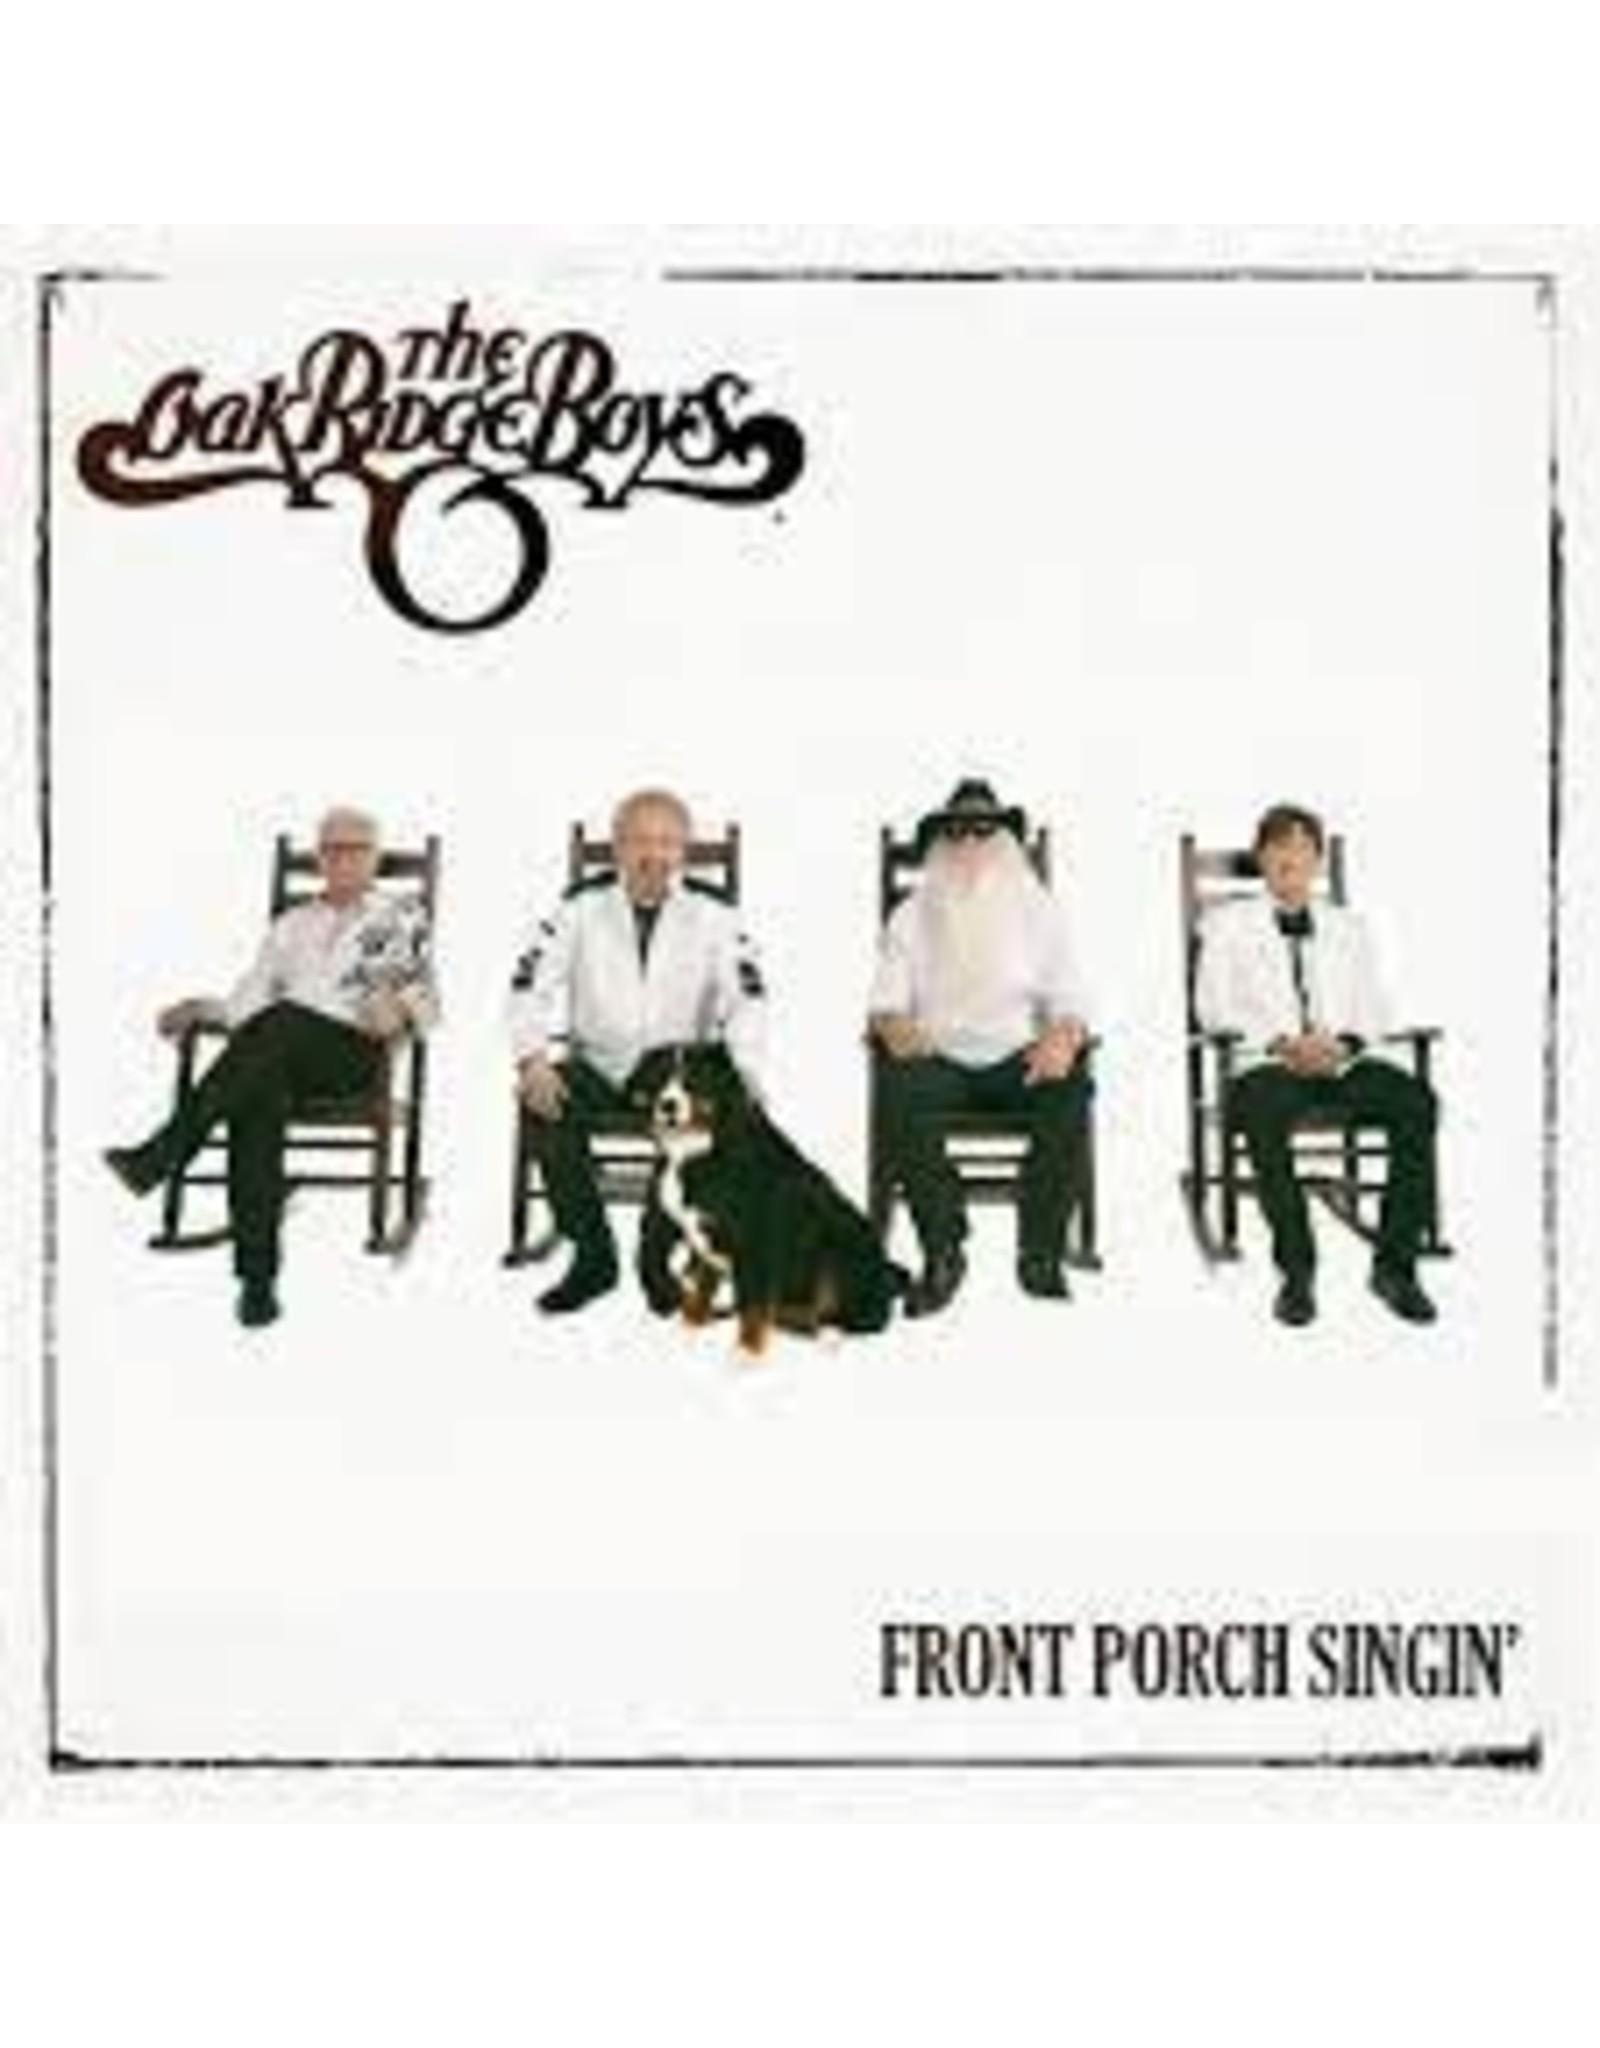 Oakridge Boys - Front Porch Singin' LP